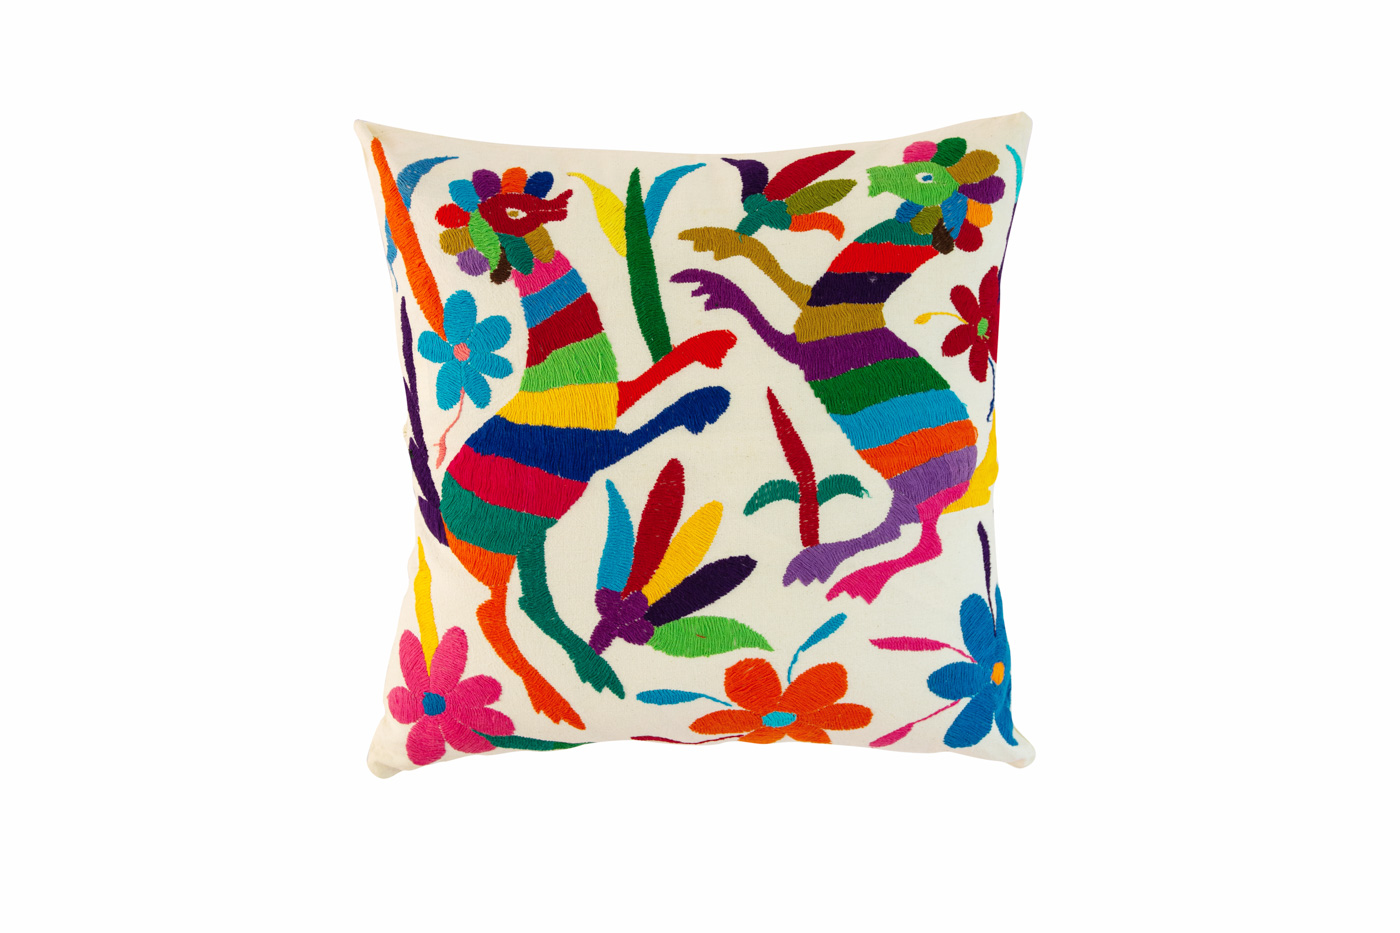 Otomi Mexican Alebrijes multicolor cushion